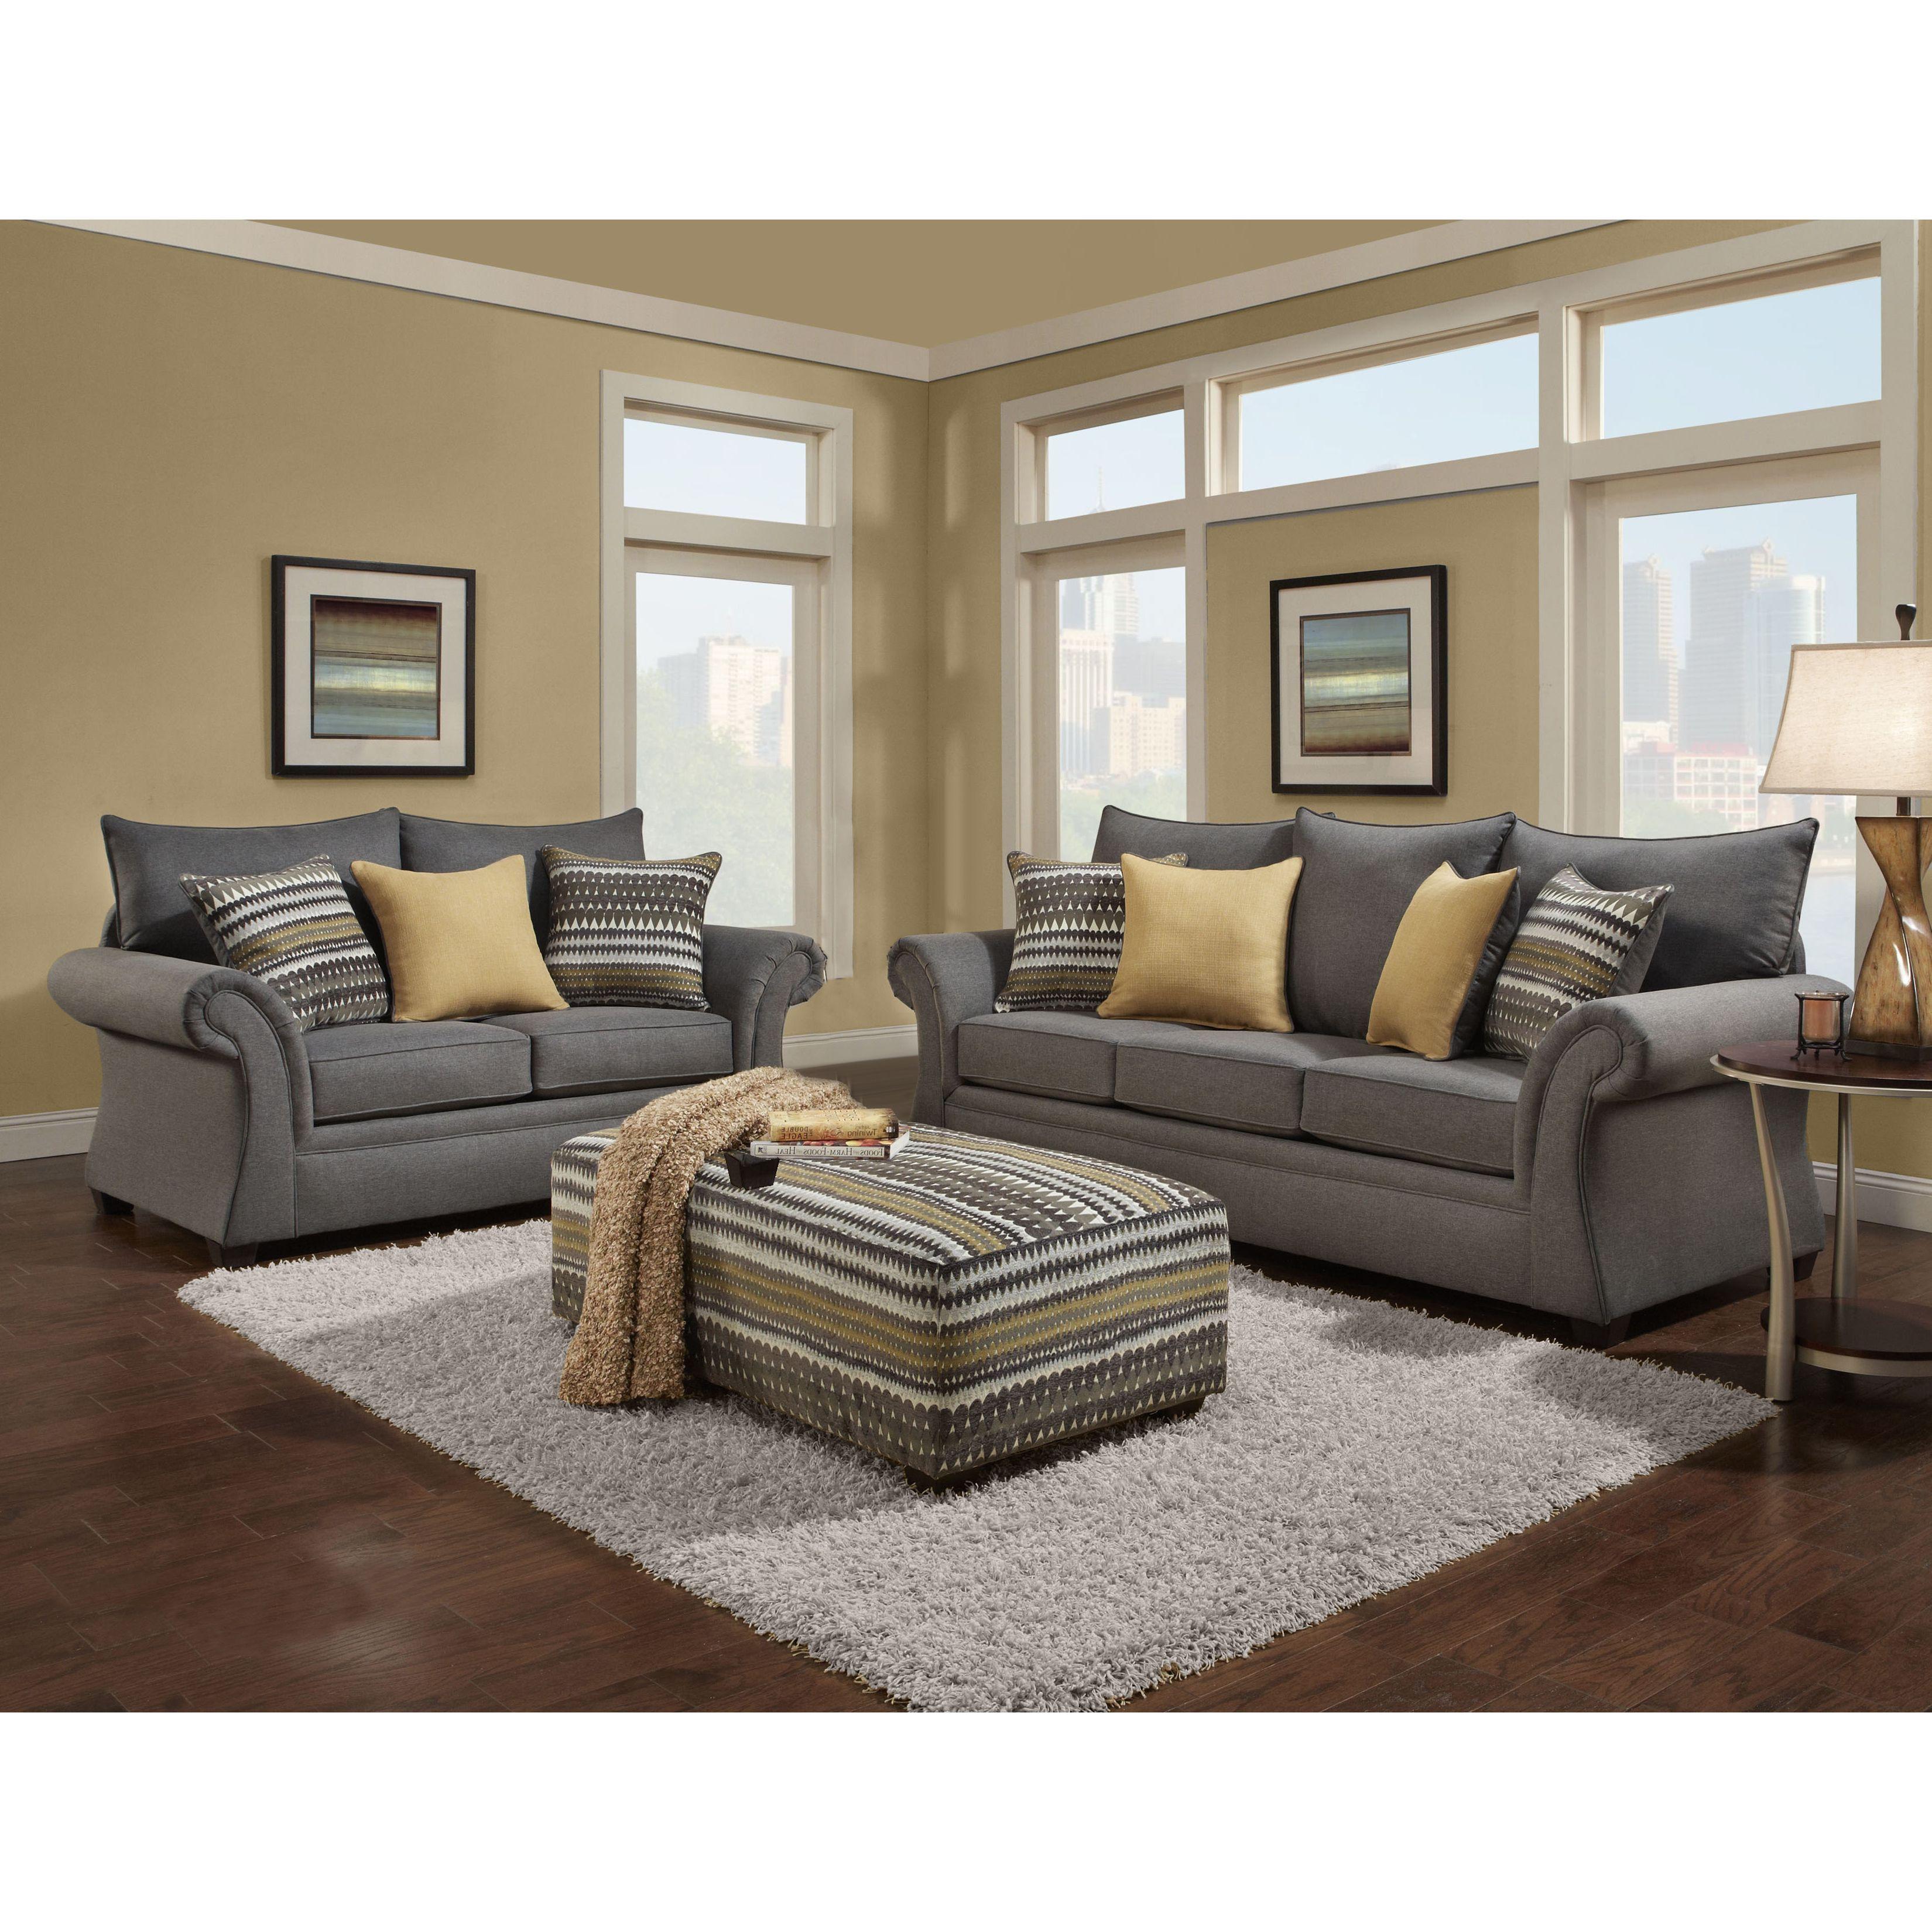 Swell Sofa Trendz Blair Grey Microfiber Sofa Loveseat And Accent Machost Co Dining Chair Design Ideas Machostcouk